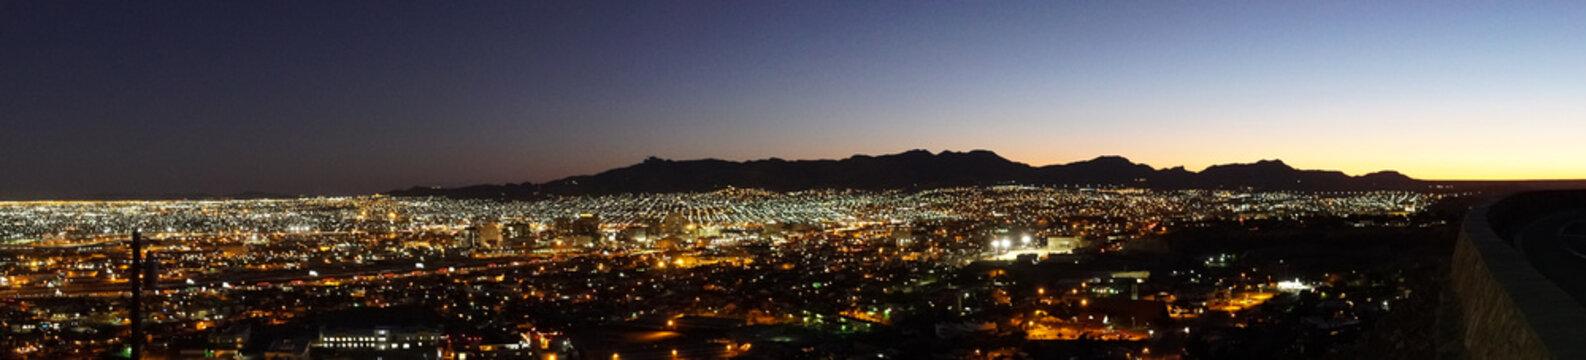 Panorama of City of El Paso in Texas Overlooking Neighborhoods and Mountain in Distance